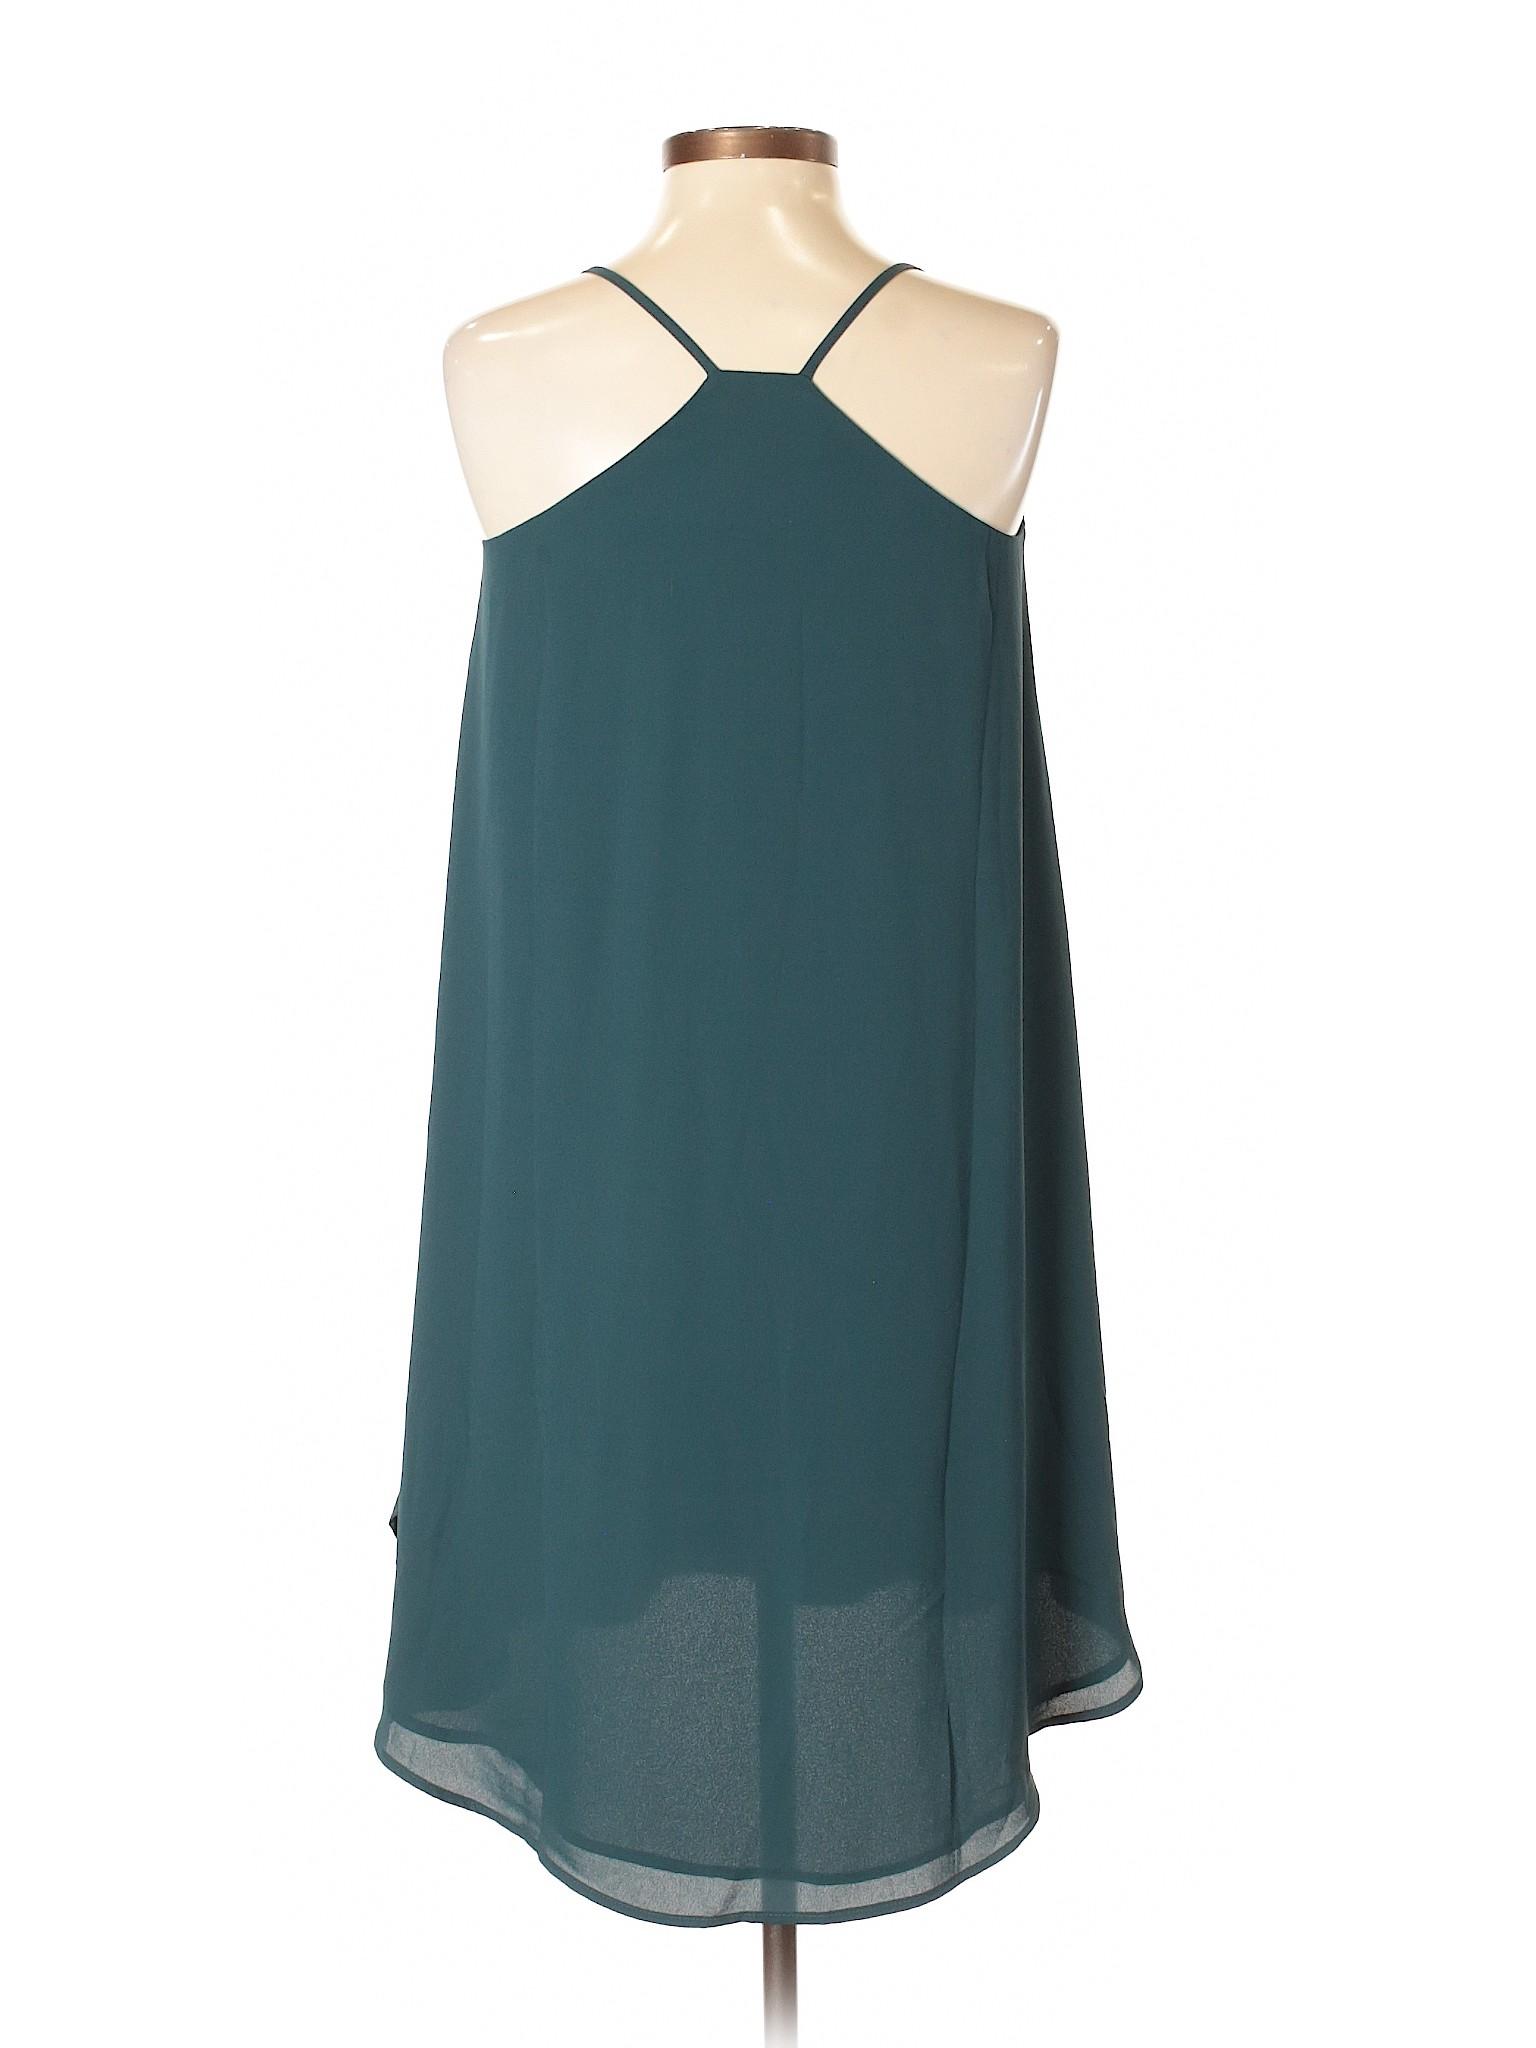 Casual Boutique Taylor Ann Dress LOFT winter 7rI7Bqwxp